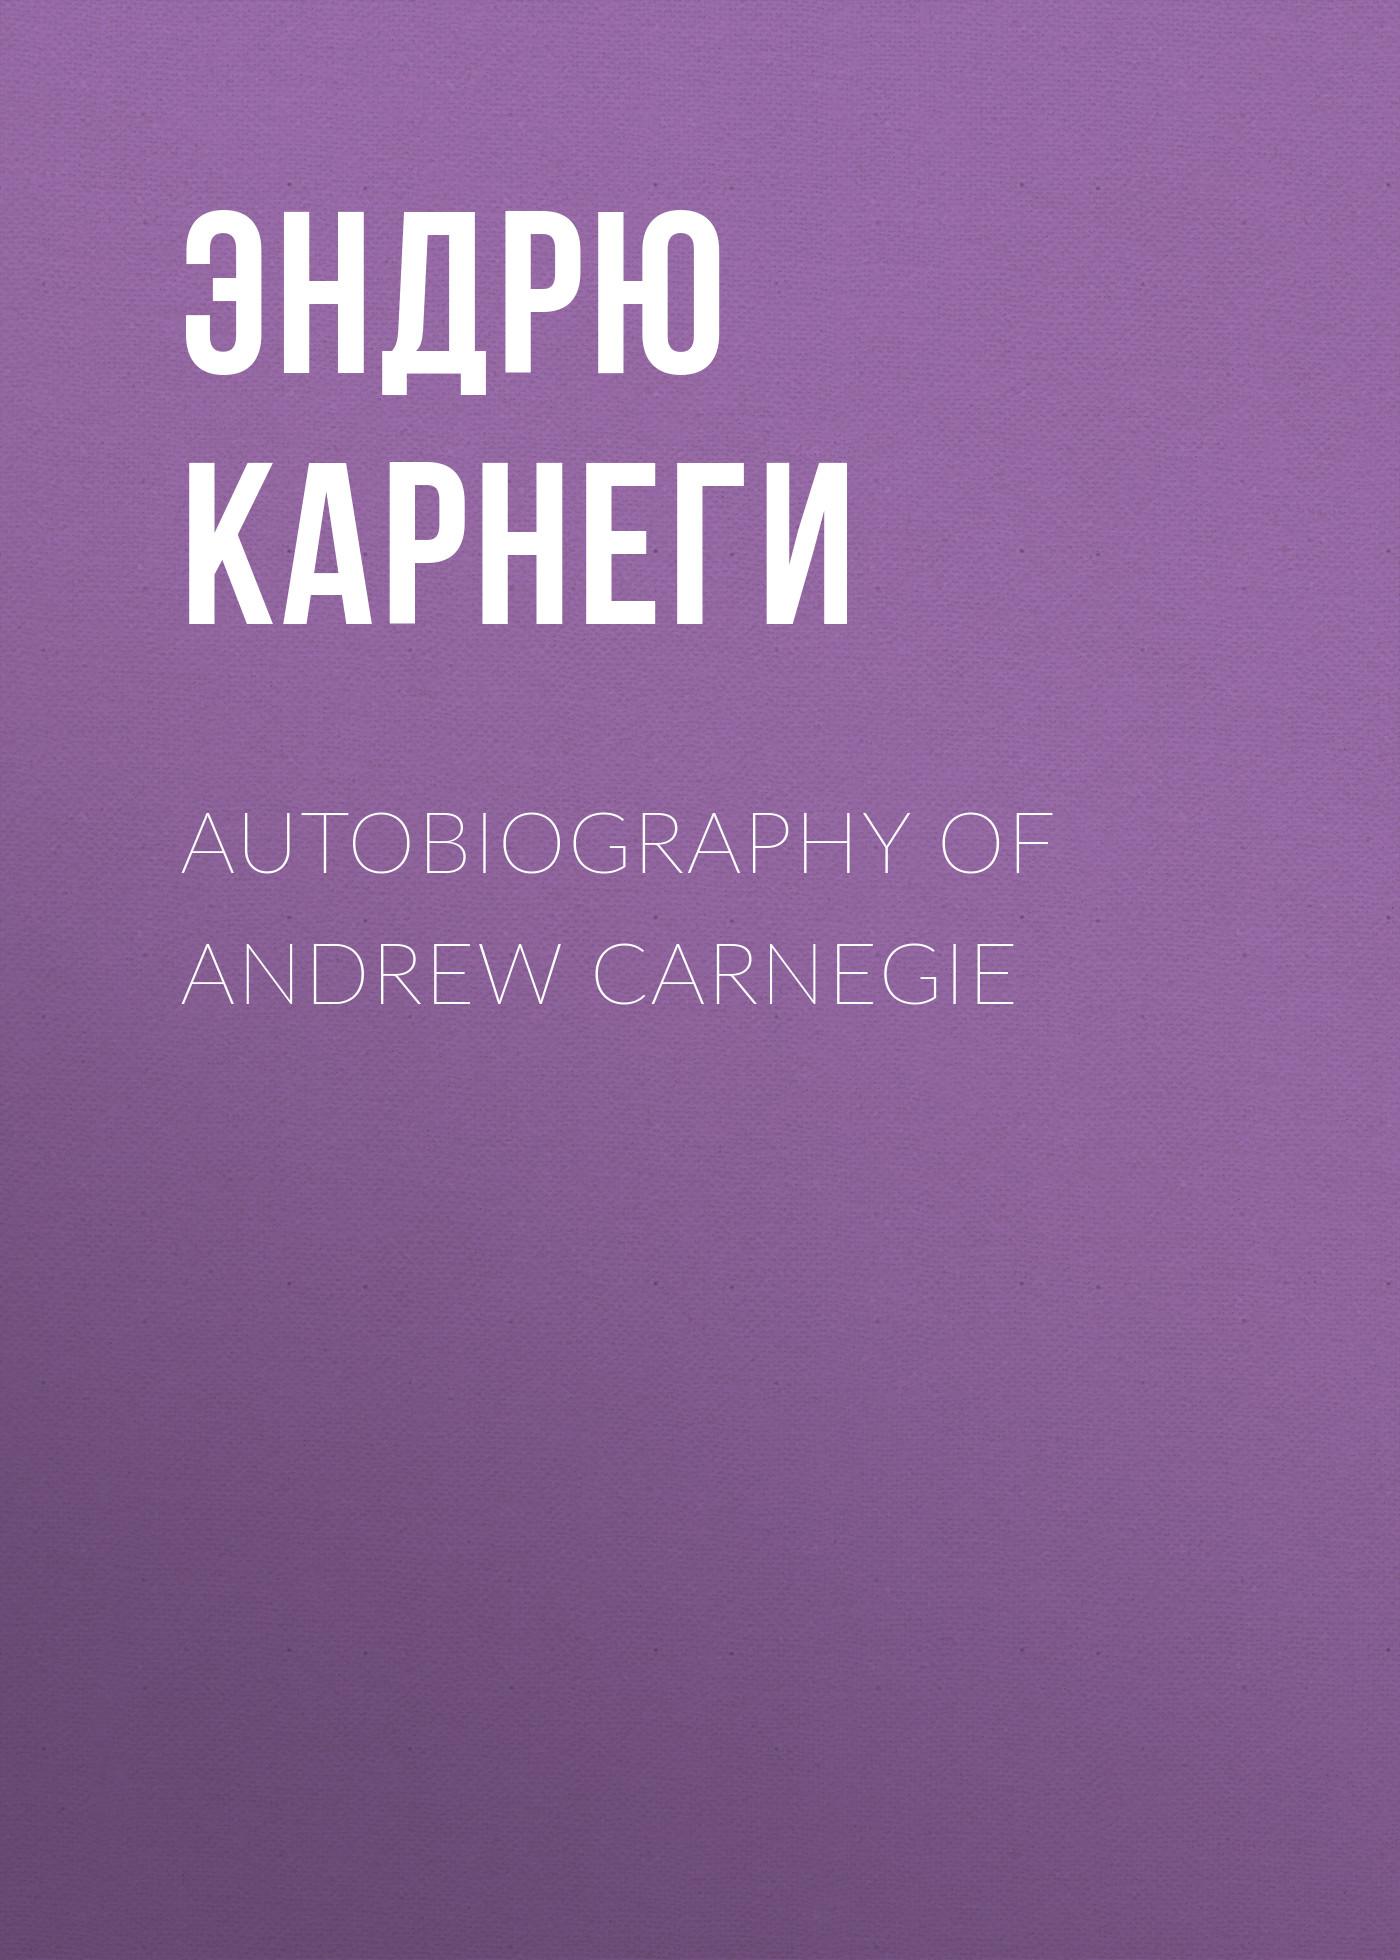 цена на Эндрю Карнеги Autobiography of Andrew Carnegie